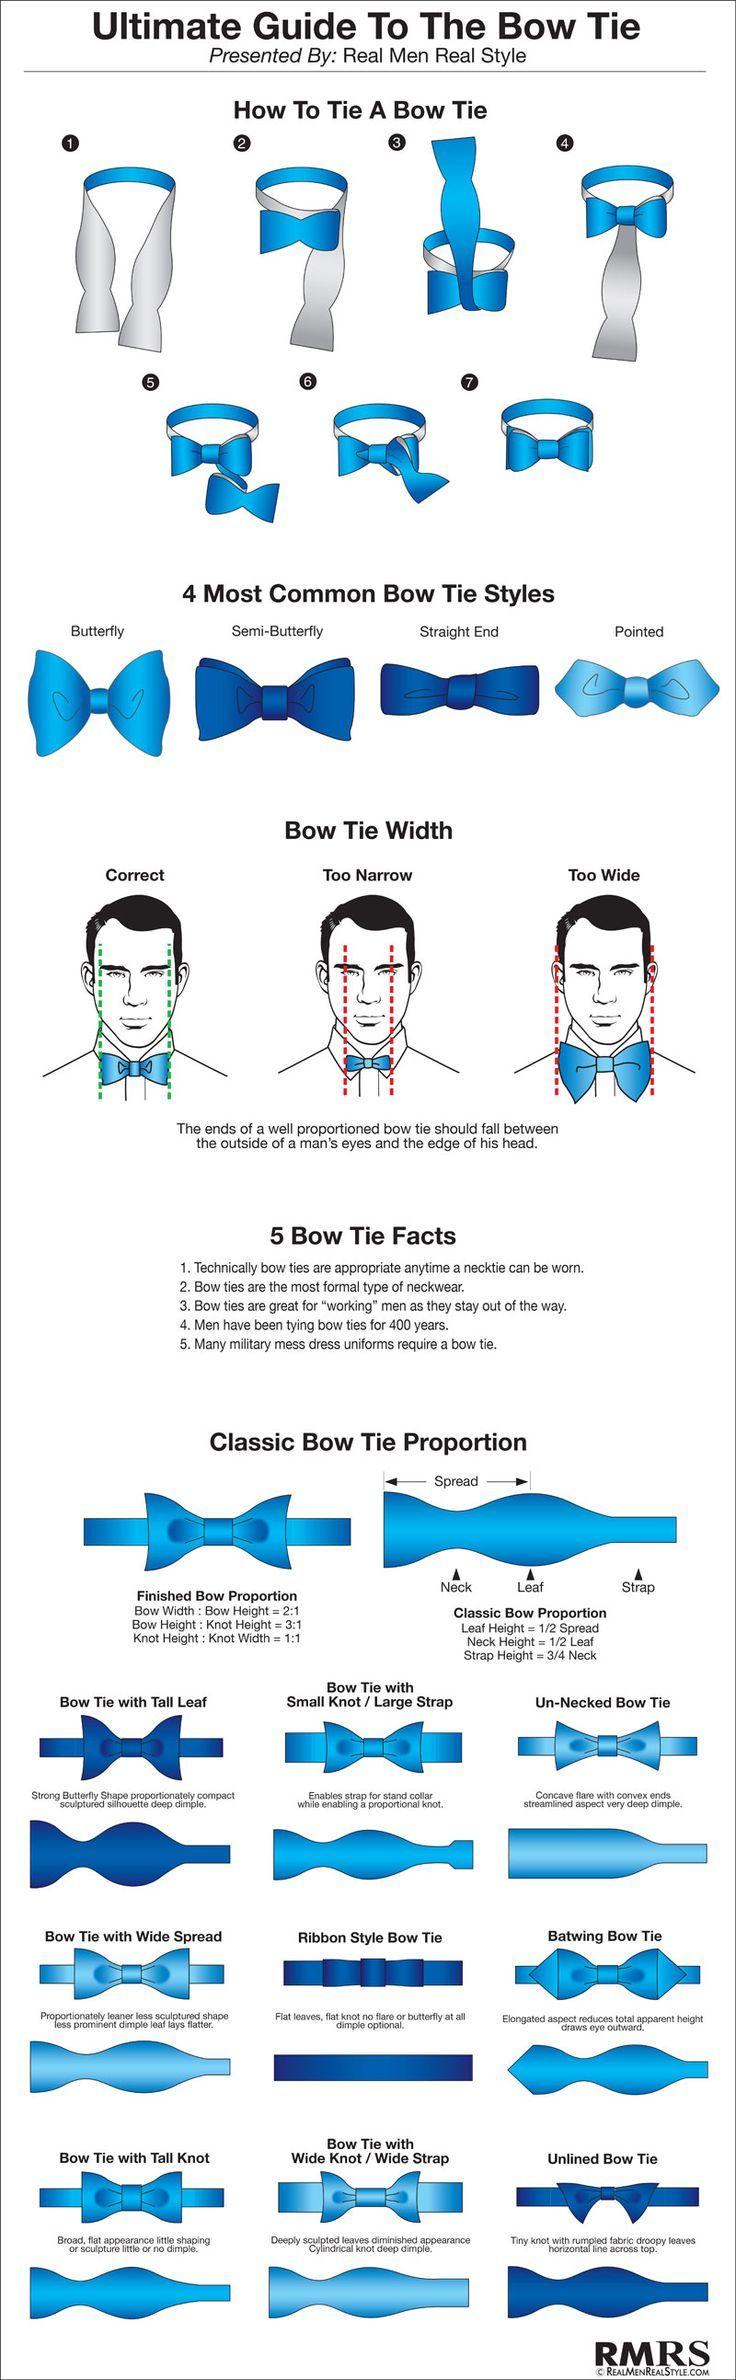 how to tie a bow tie, how to tie a bow tie step by step